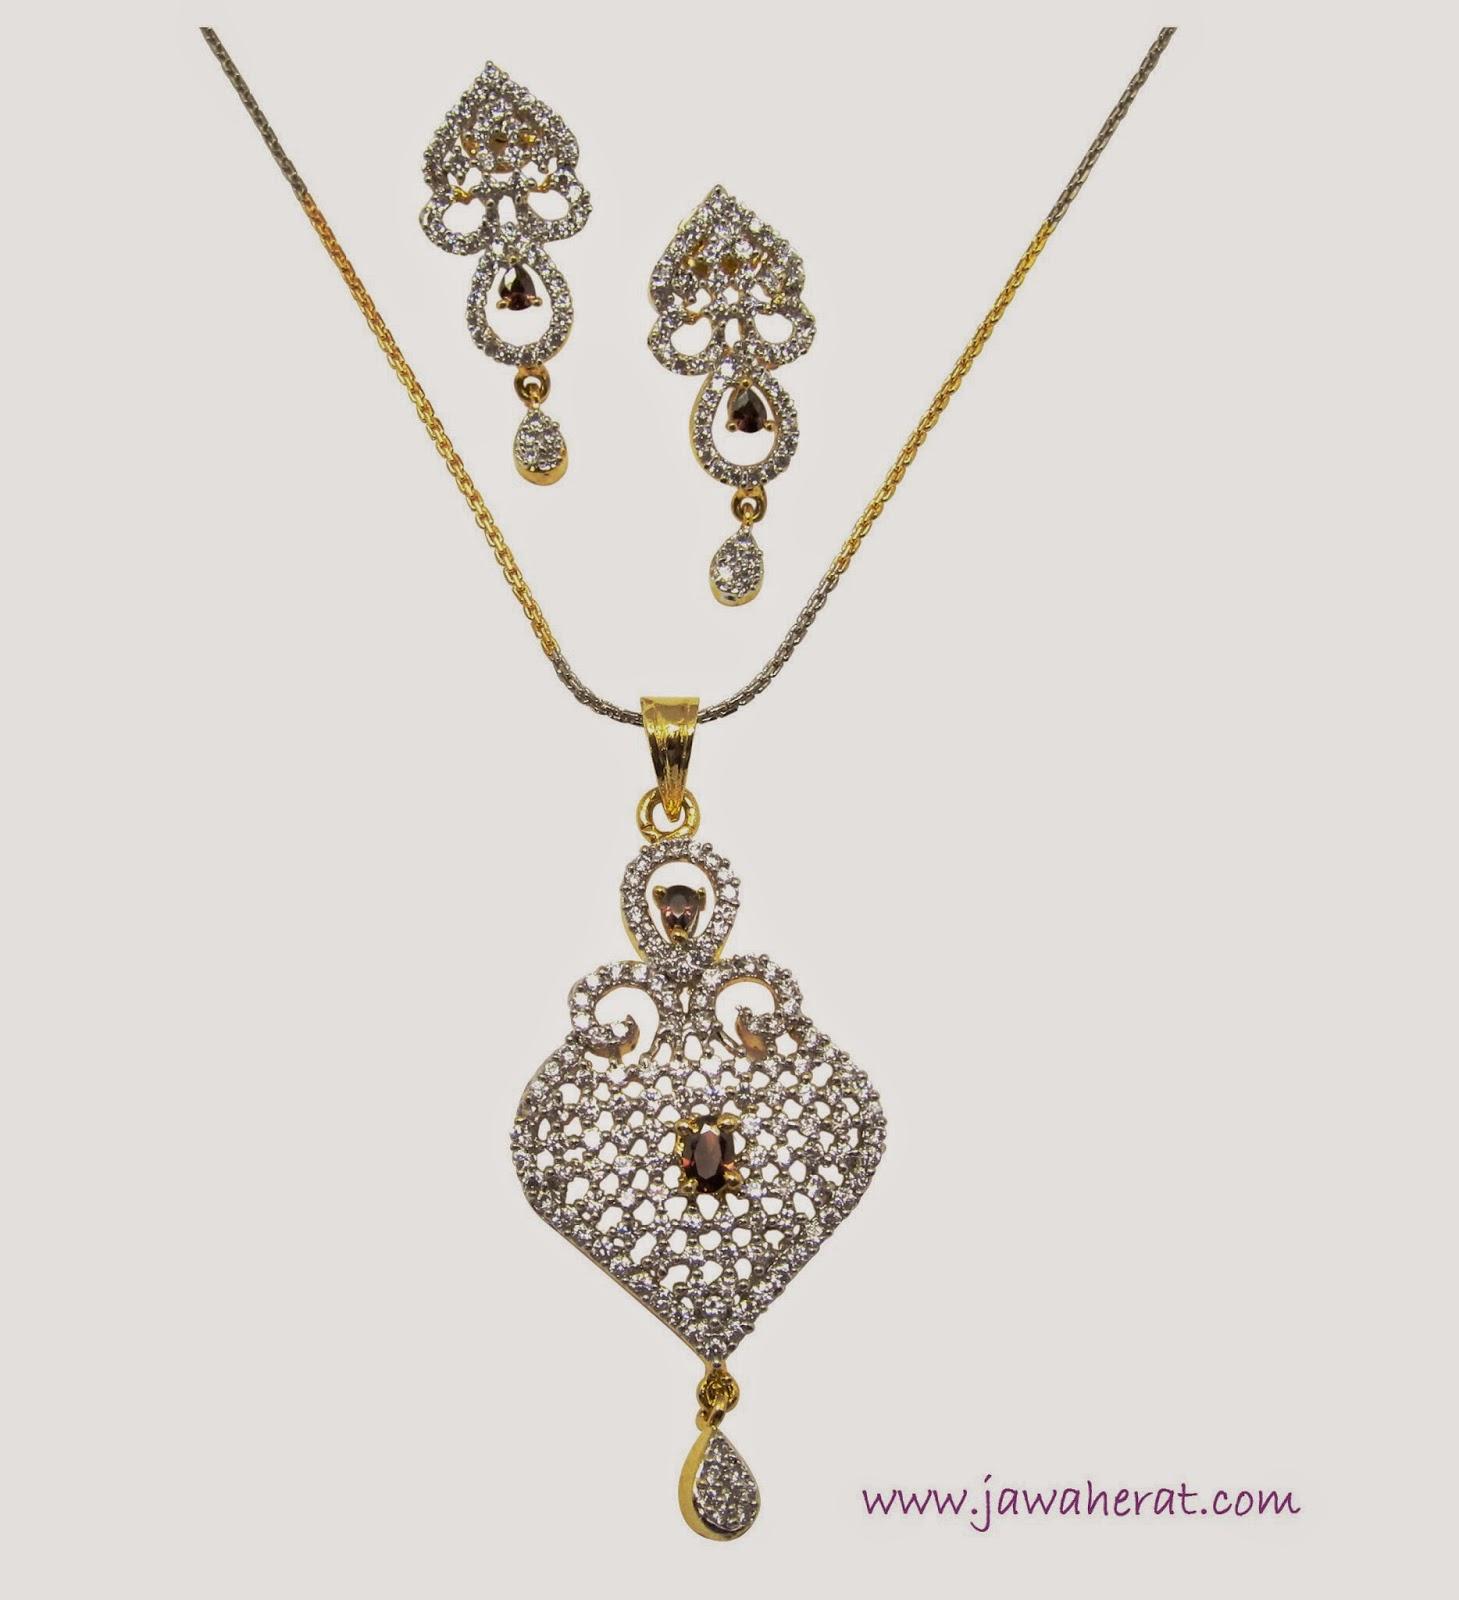 Jawaherat Amethyst Jewelry